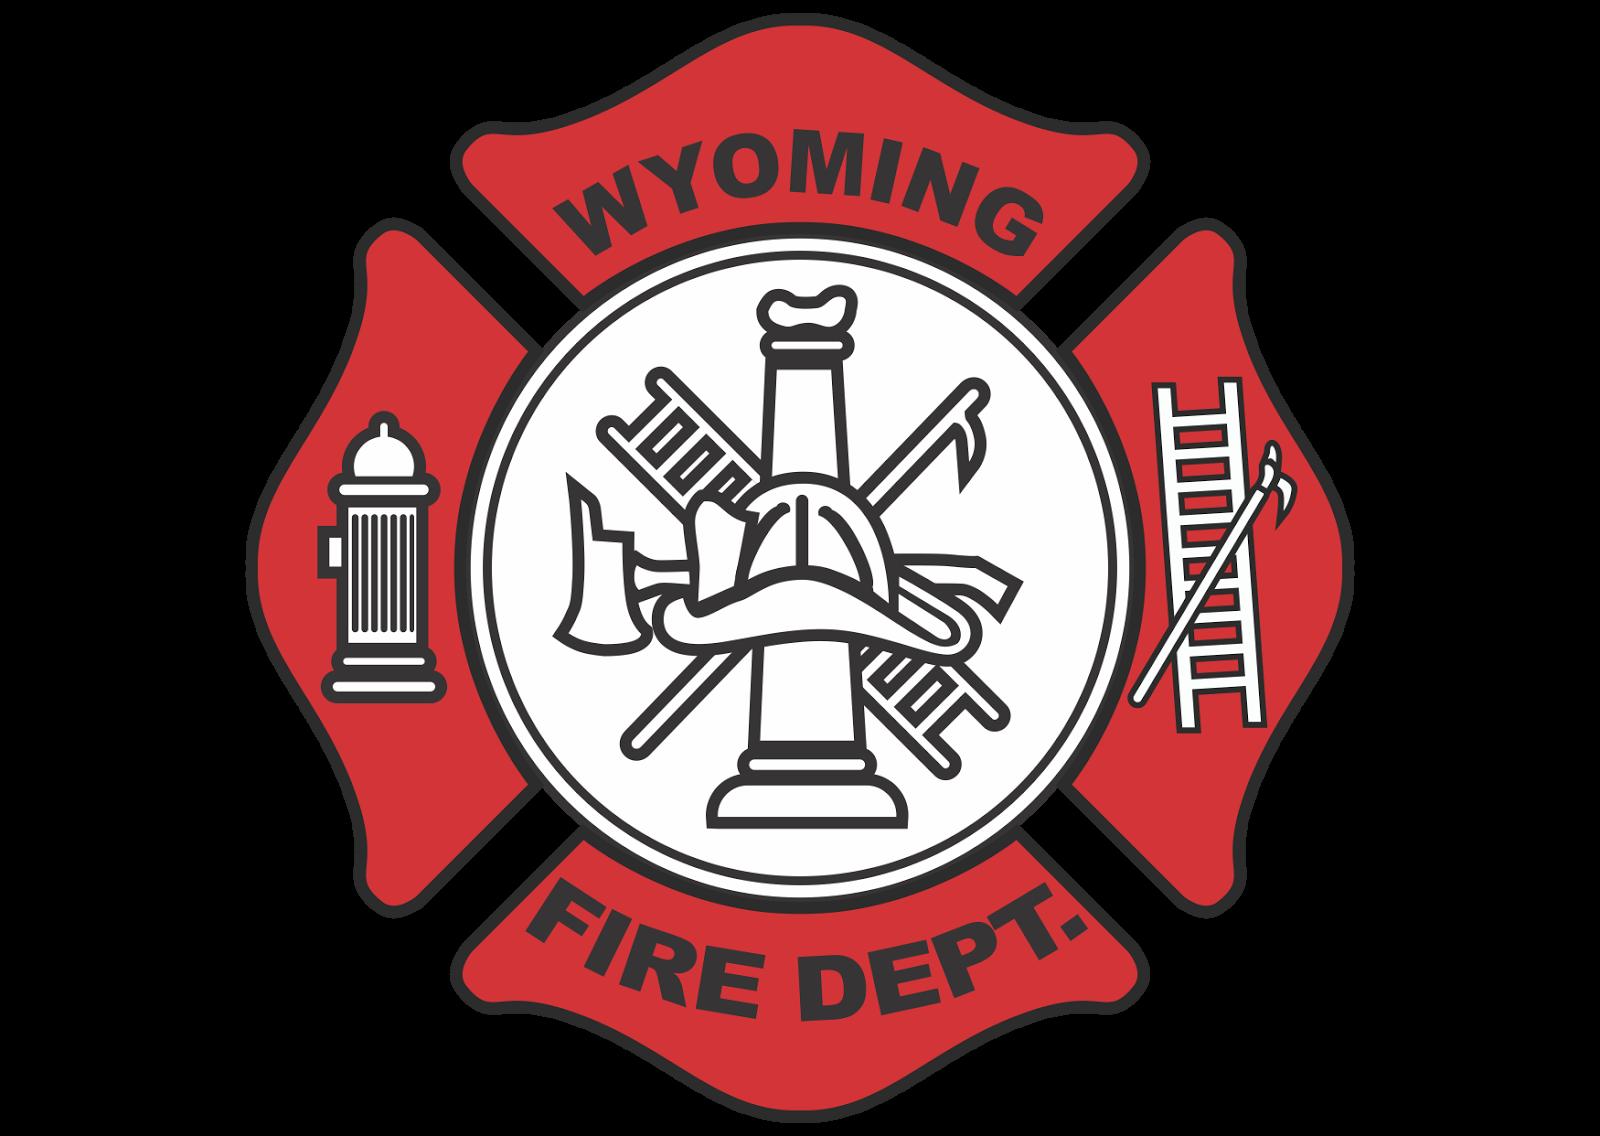 wyoming fire department logo vector format cdr ai eps svg pdf png rh master logo blogspot com fire department logo vector fire department logos or symbols